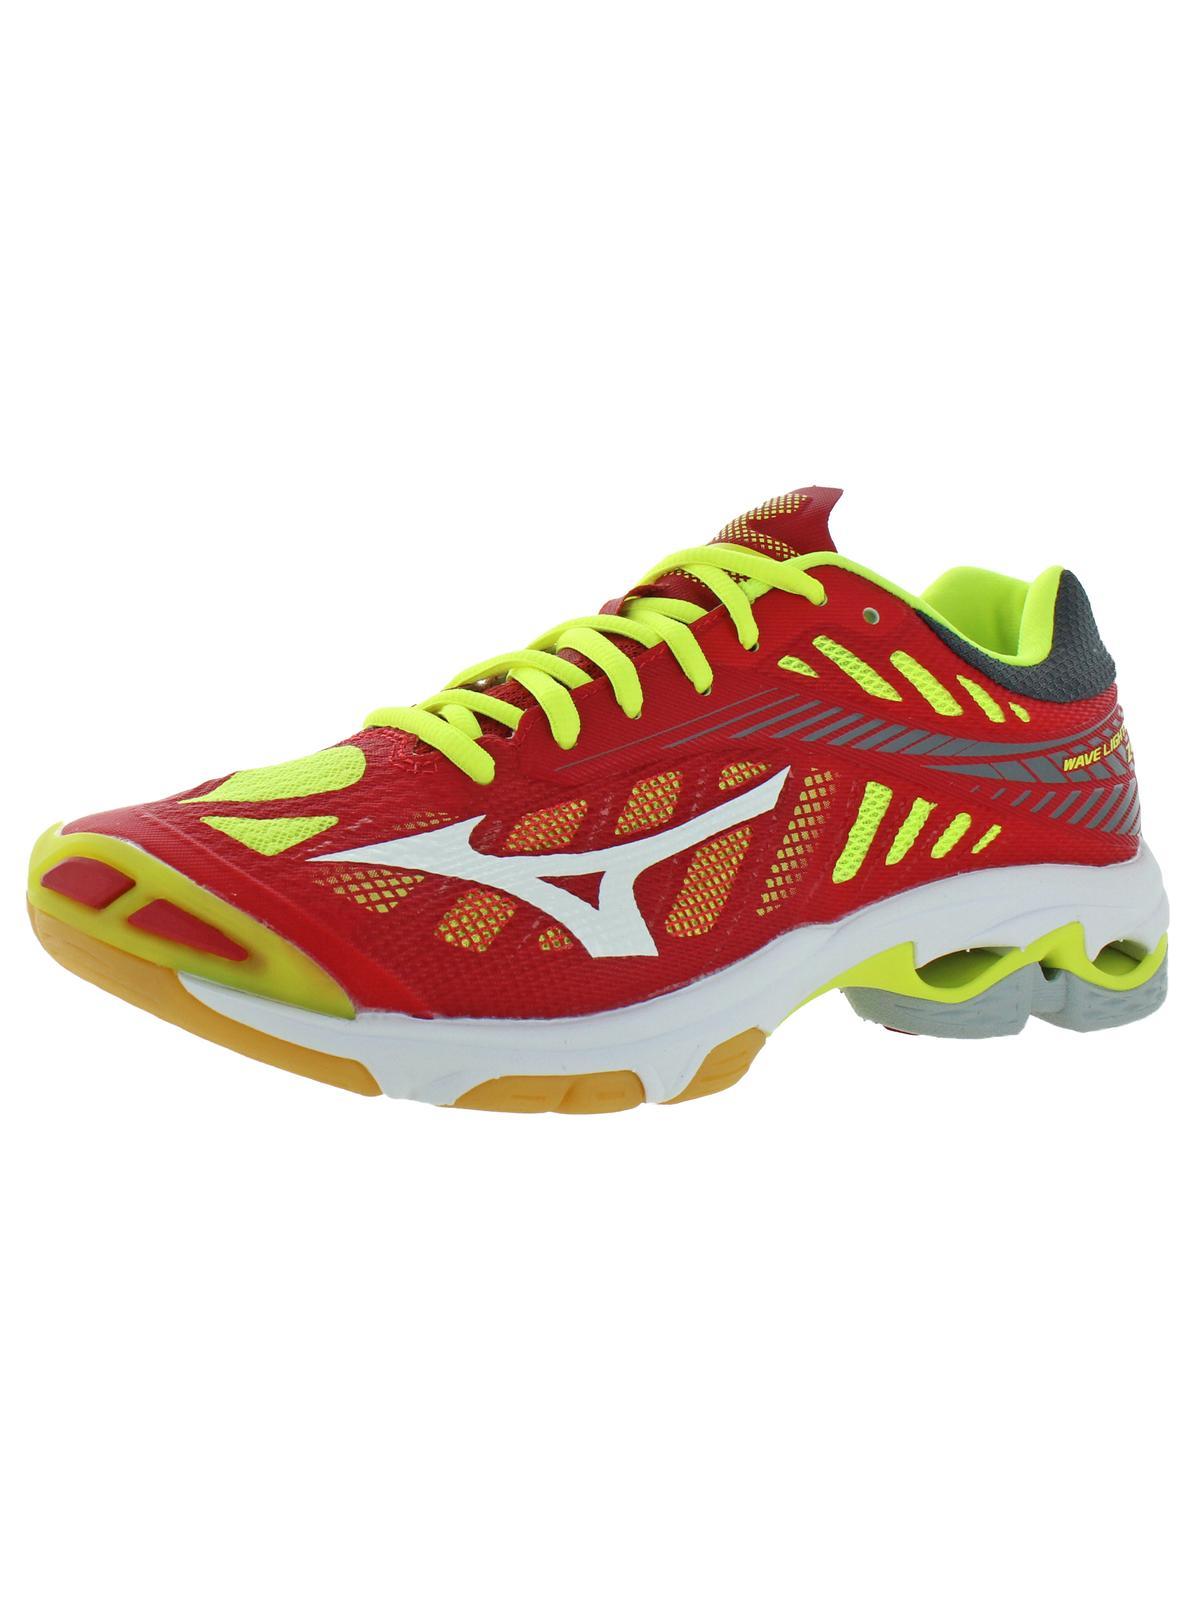 mizuno shoes usa volleyball us 80